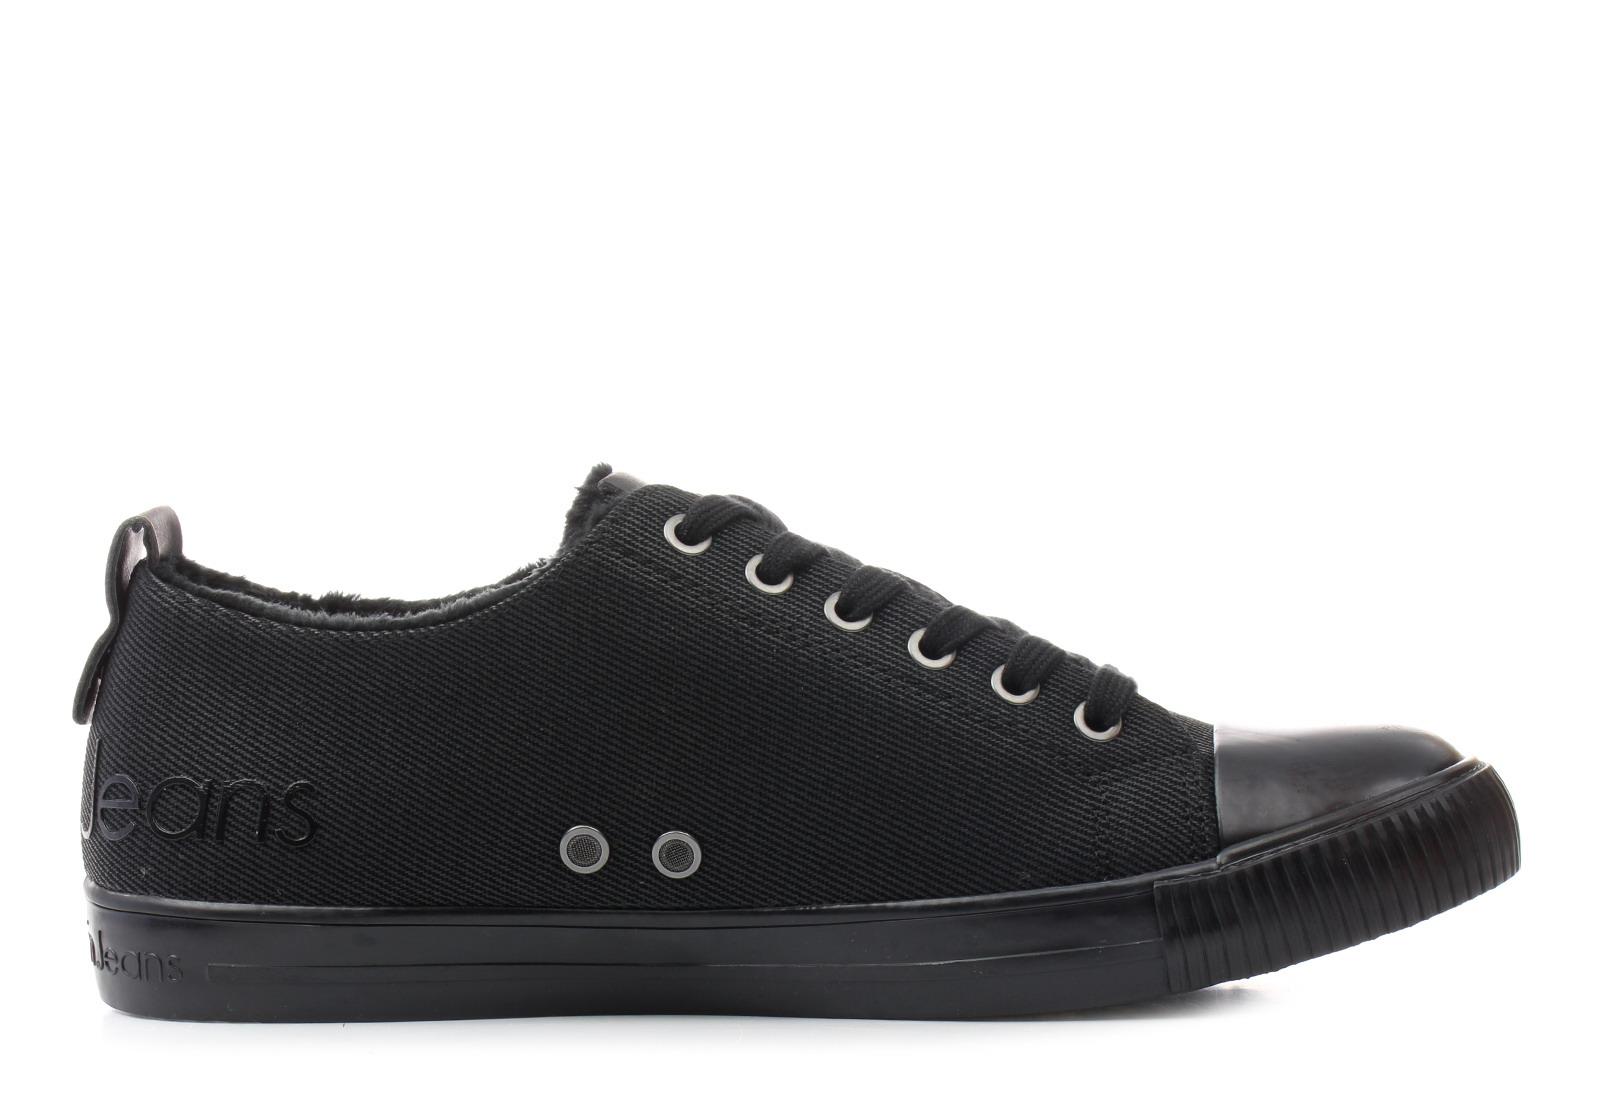 Calvin Klein Jeans Cipő - Arturo - S0475-BLK - Office Shoes Magyarország 4f631541bc